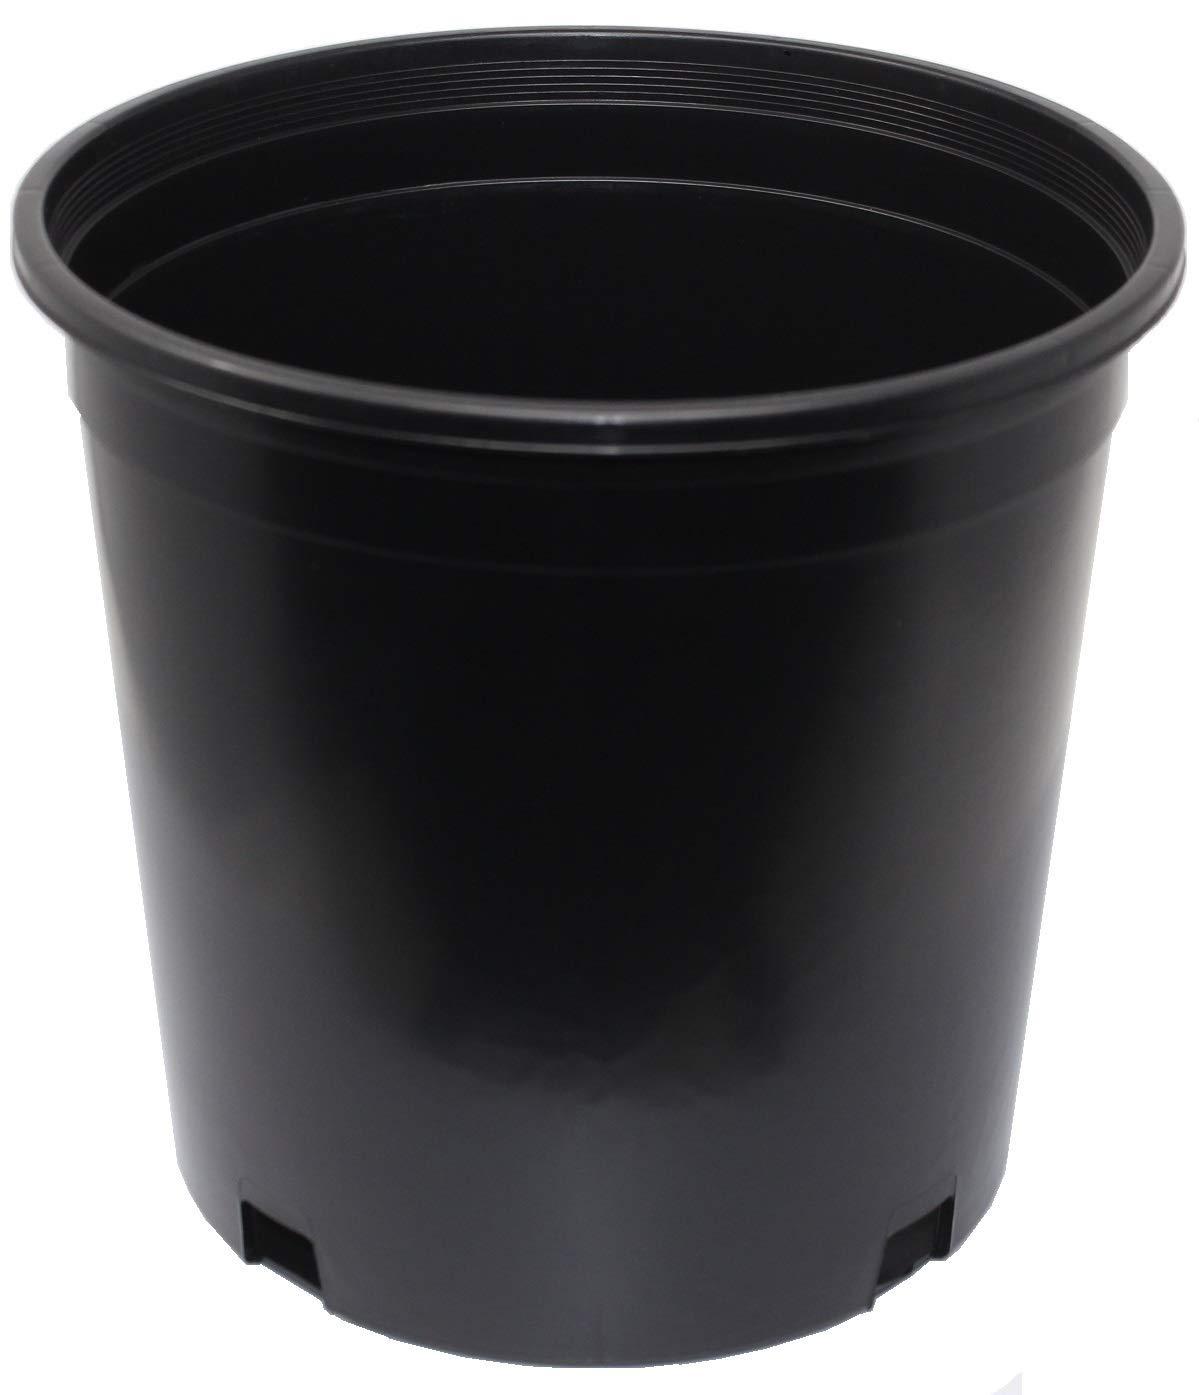 2 Gallon Plant Flower Pot by Hypergreens Plastic Nursery Pot for Plants Packs of 10